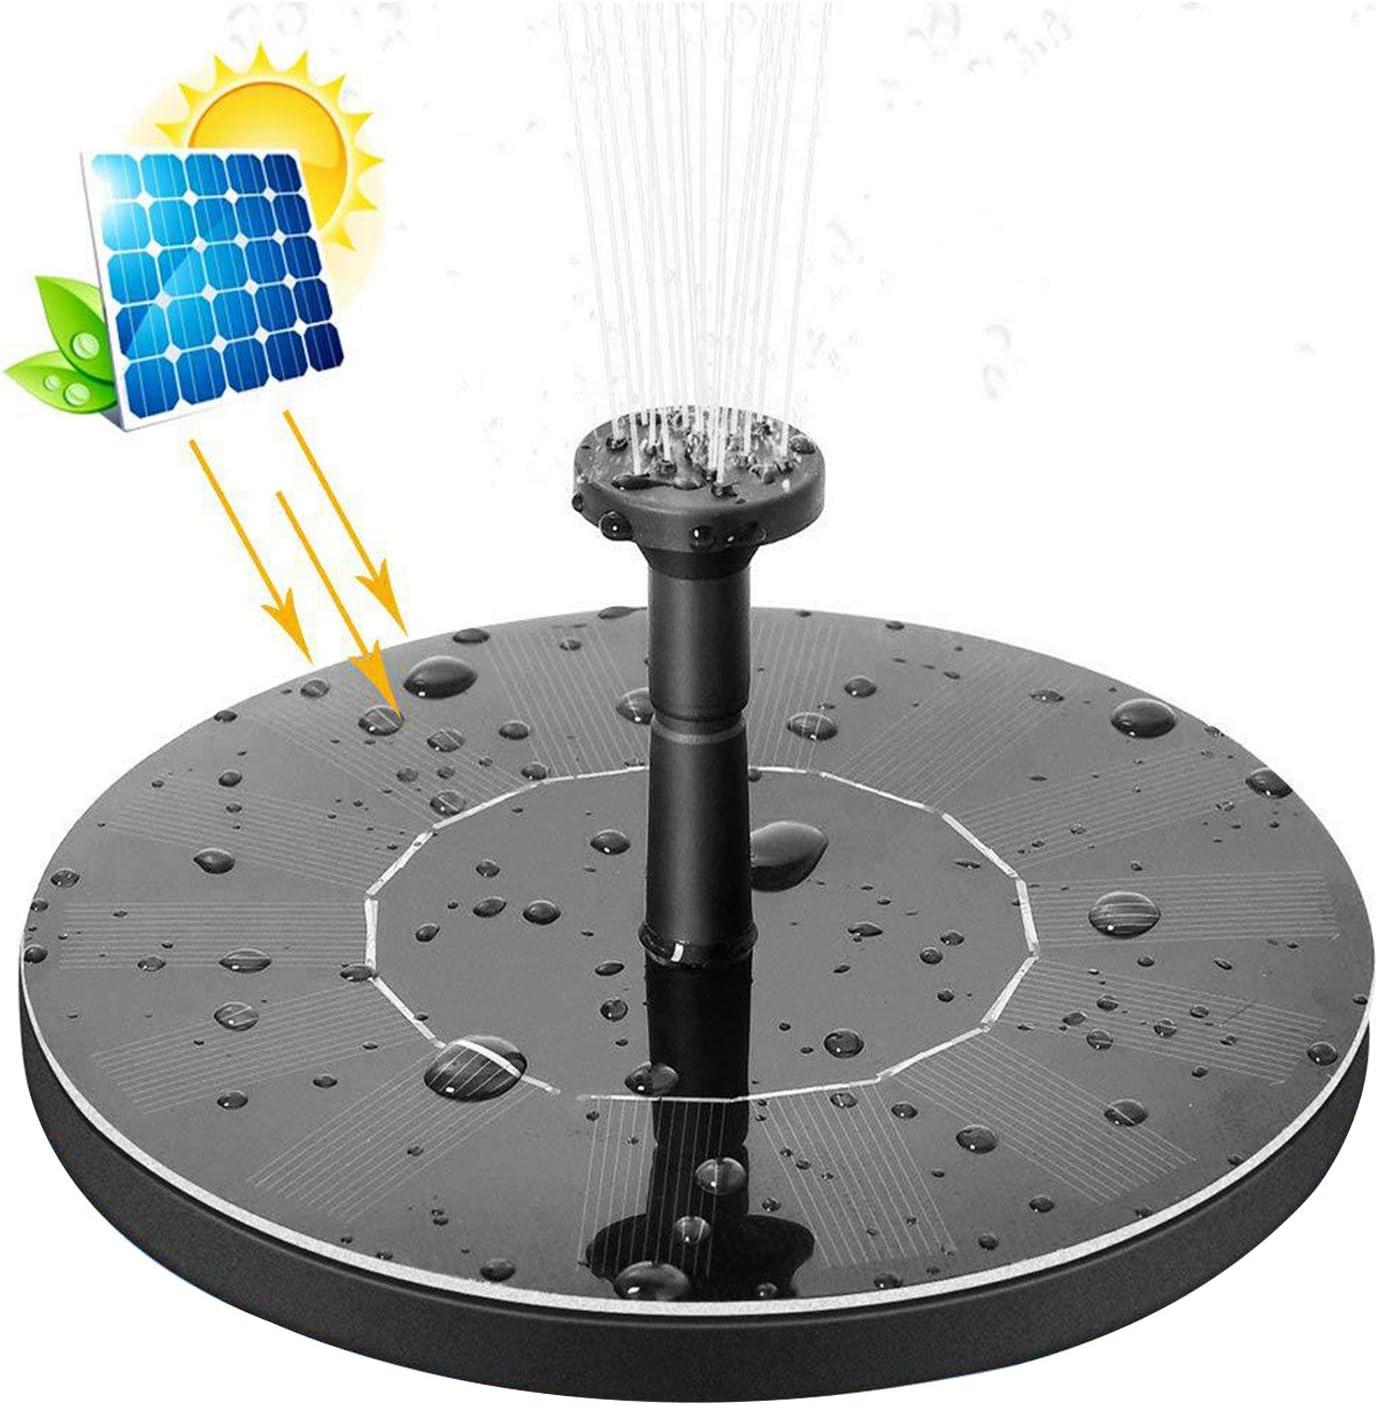 FSTIKO Solar Fountain Pump Free Bird Overseas parallel import regular item New product!! Bath